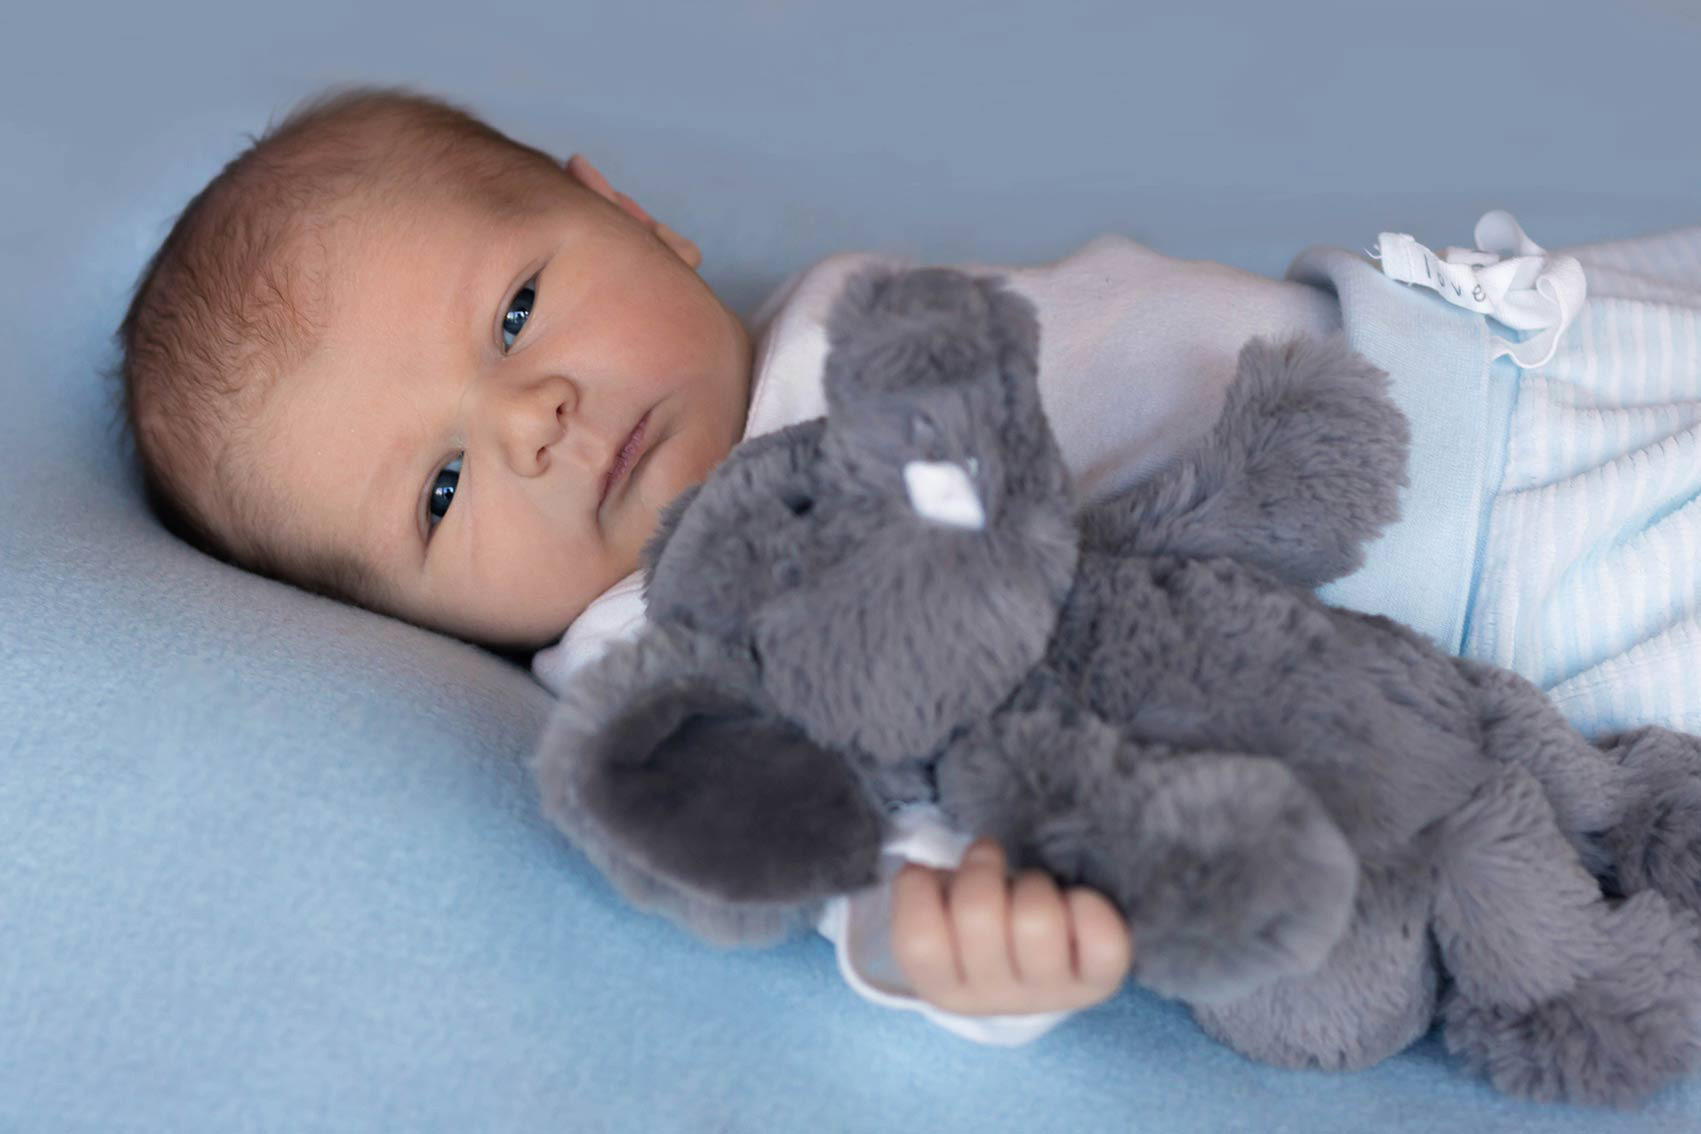 Newborn-Photography-BabyBoy-200kb-9